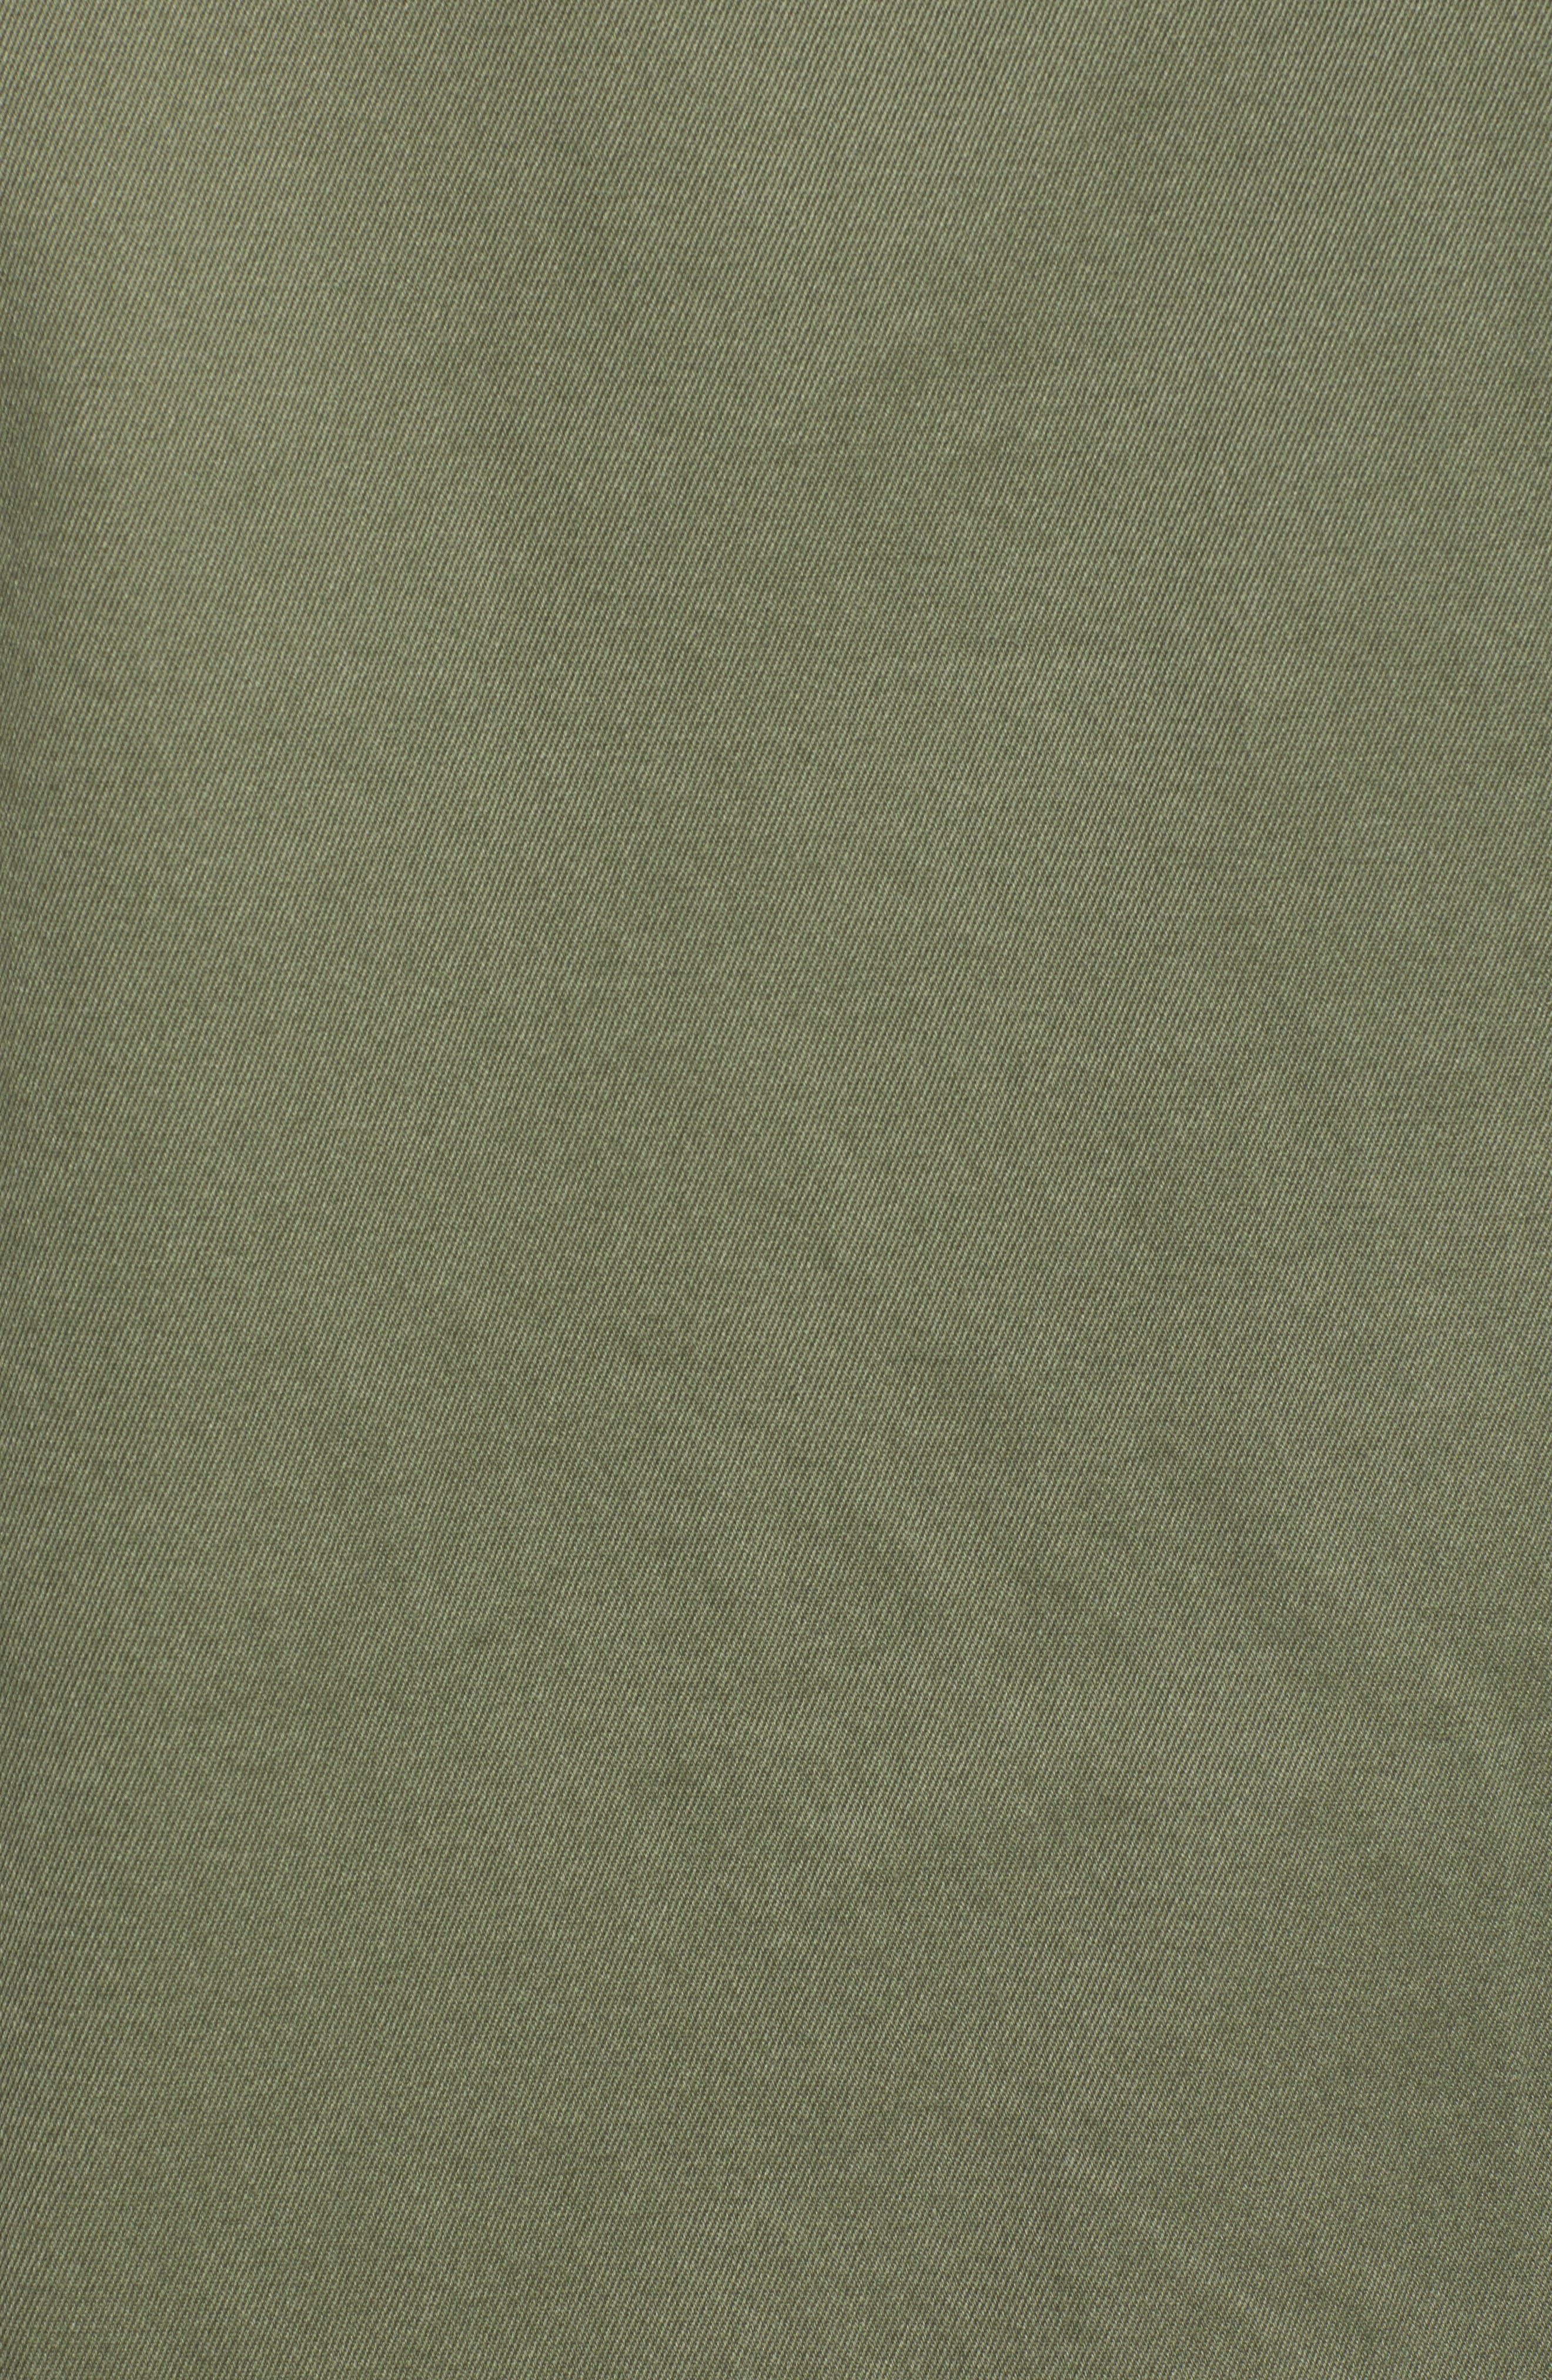 Regular Fit Military Shirt Jacket,                             Alternate thumbnail 6, color,                             SURPLUS OLIVE